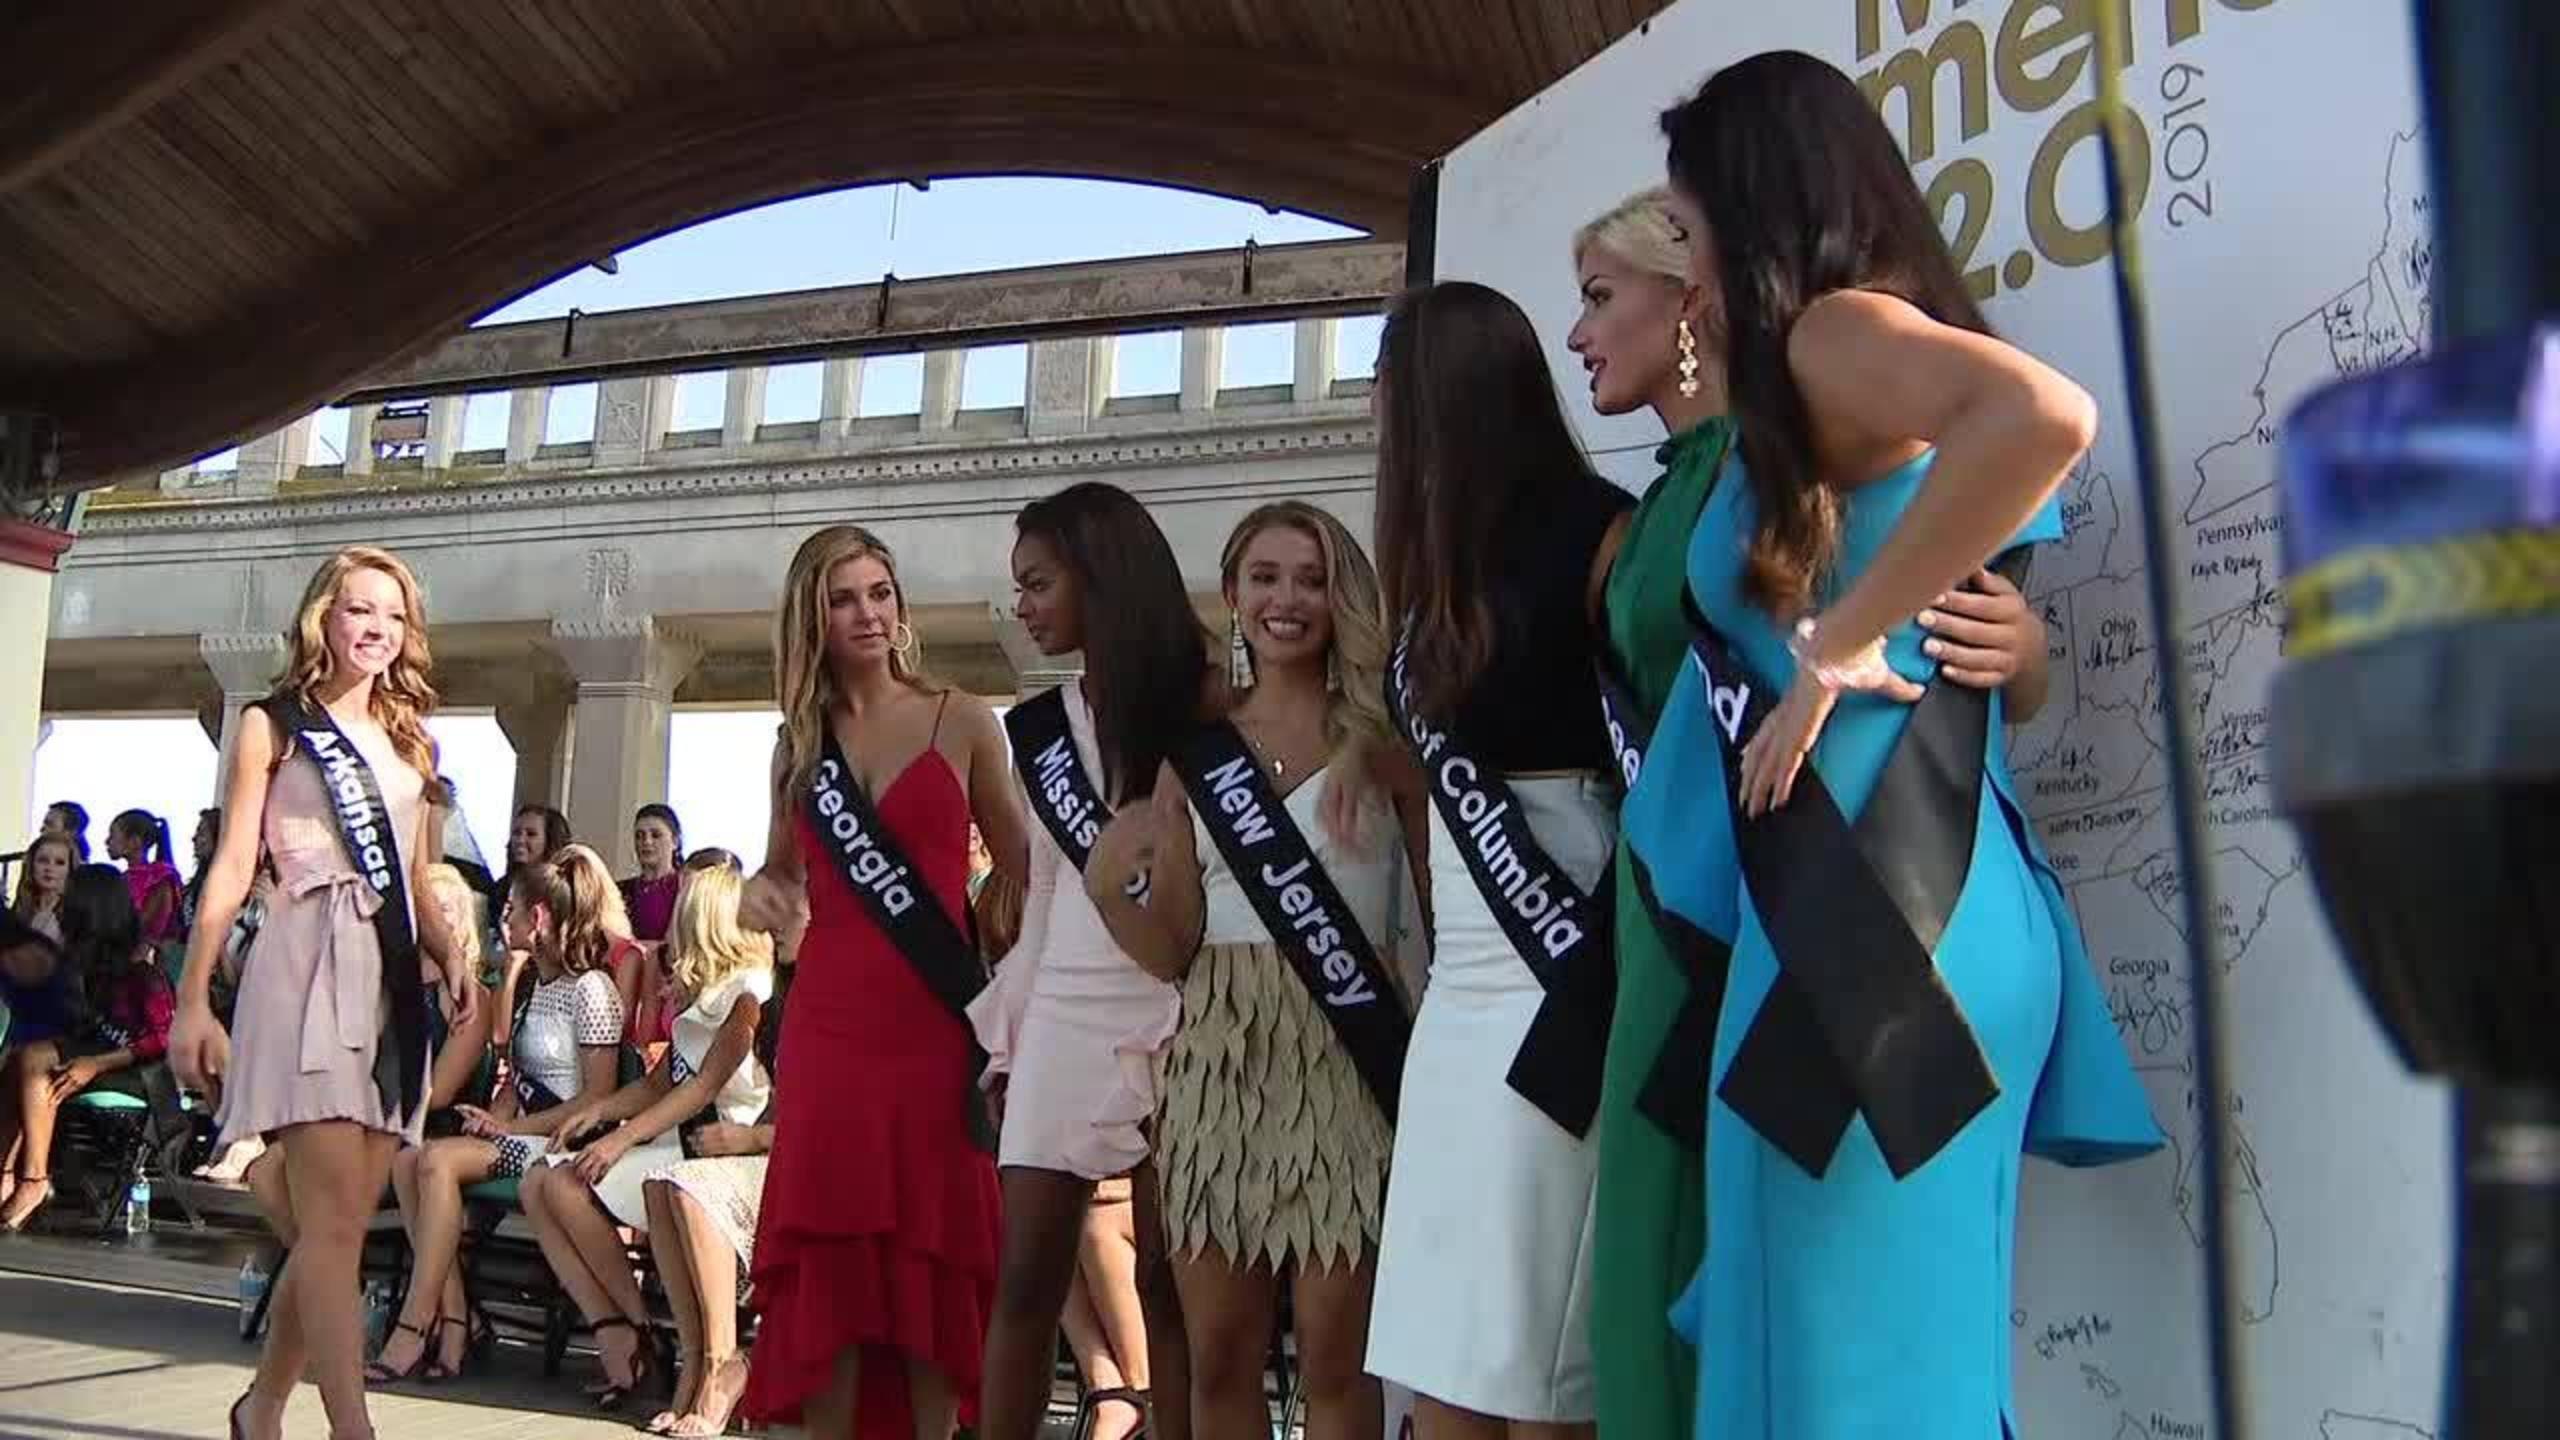 Gretchen Carlson stepping down as Miss America chairwoman